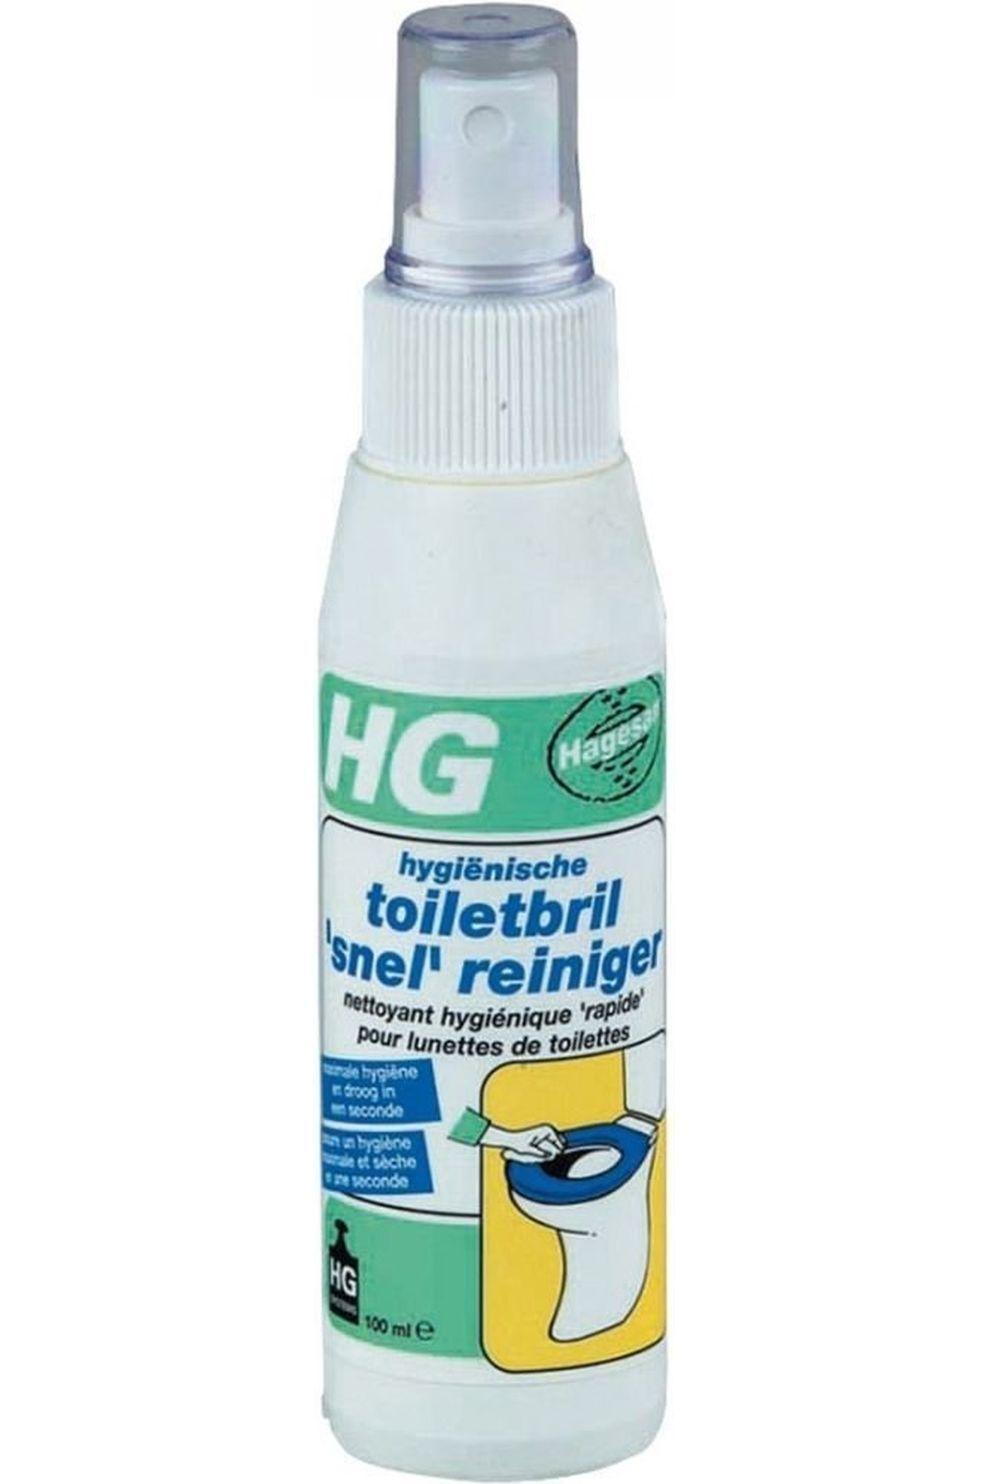 Van Assendelft Toilet Acc Toiletbril Snelreiniger Spuitflacon - / Transparant